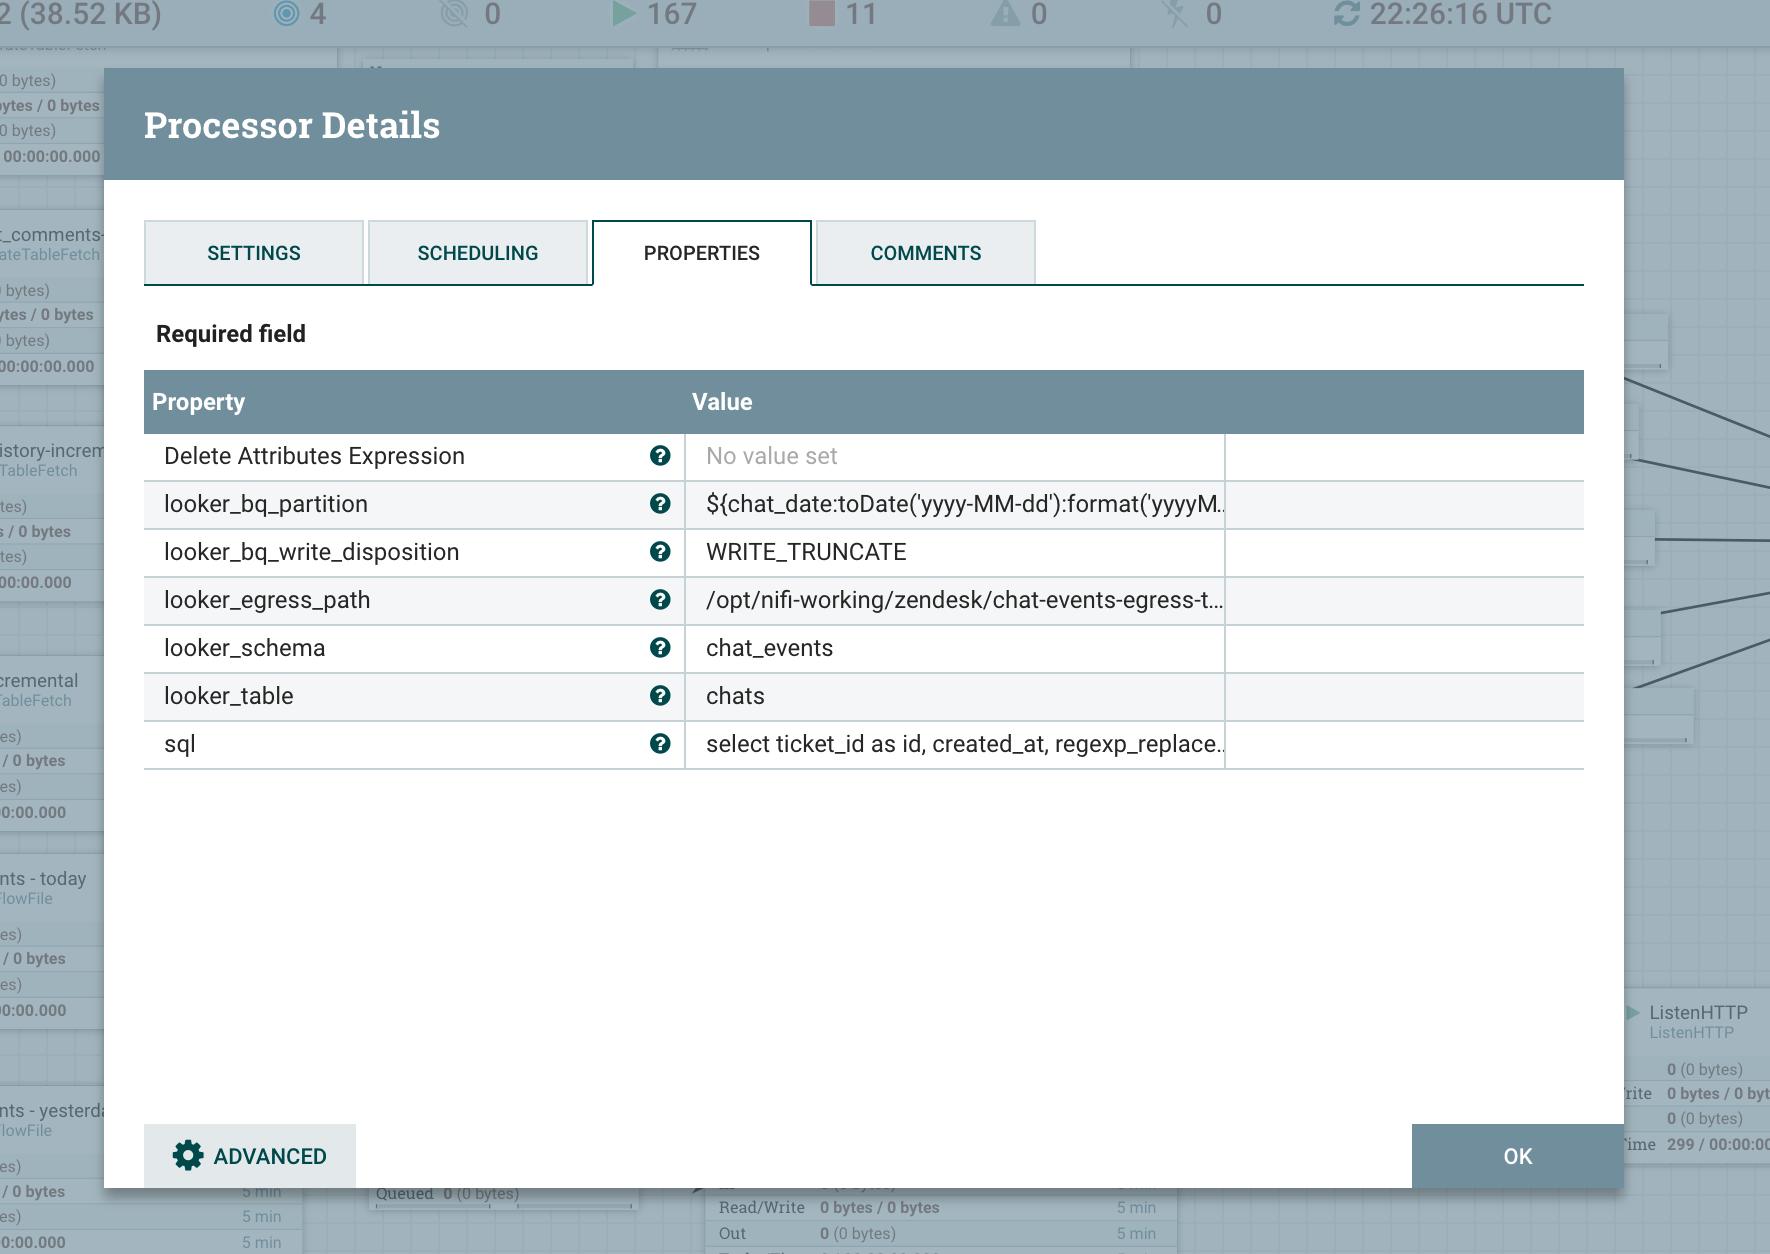 Processor Details